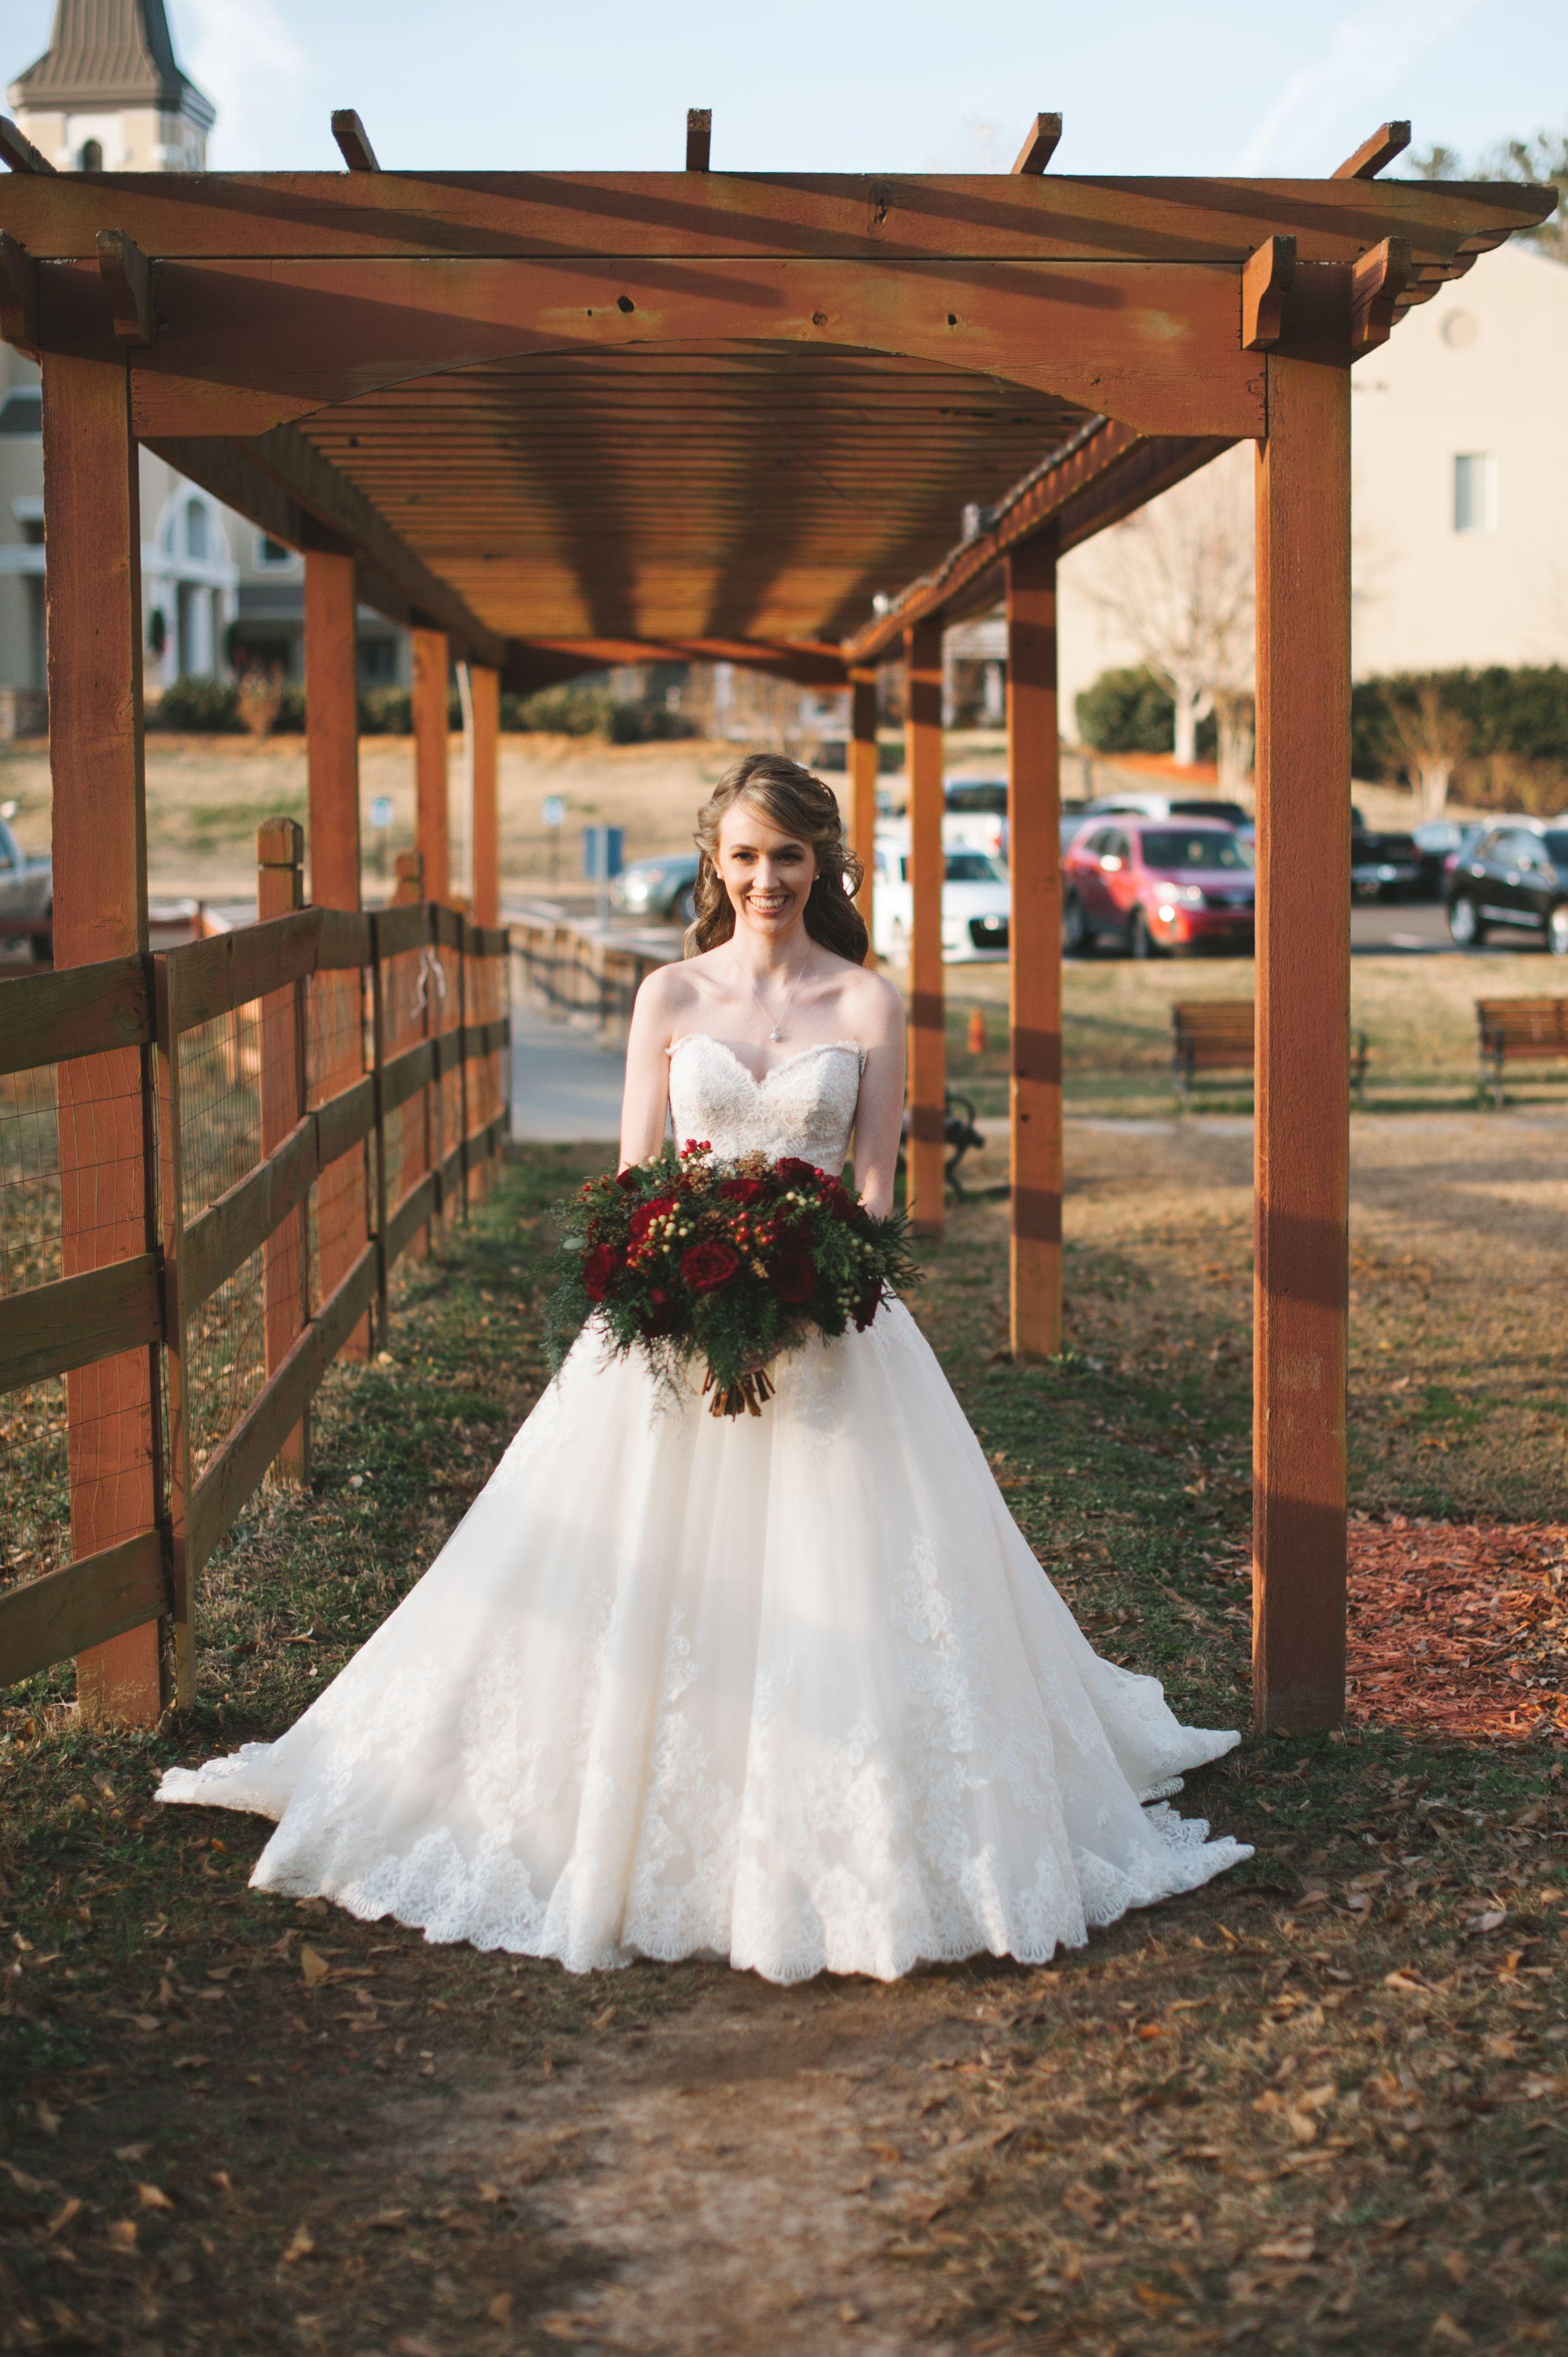 Wedding Dress At Wedding Angels Bridal Boutique Elegant Wedding Dress Strapless Wedd Wedding Dresses Stylish Wedding Dresses Strapless Wedding Dress Ballgown